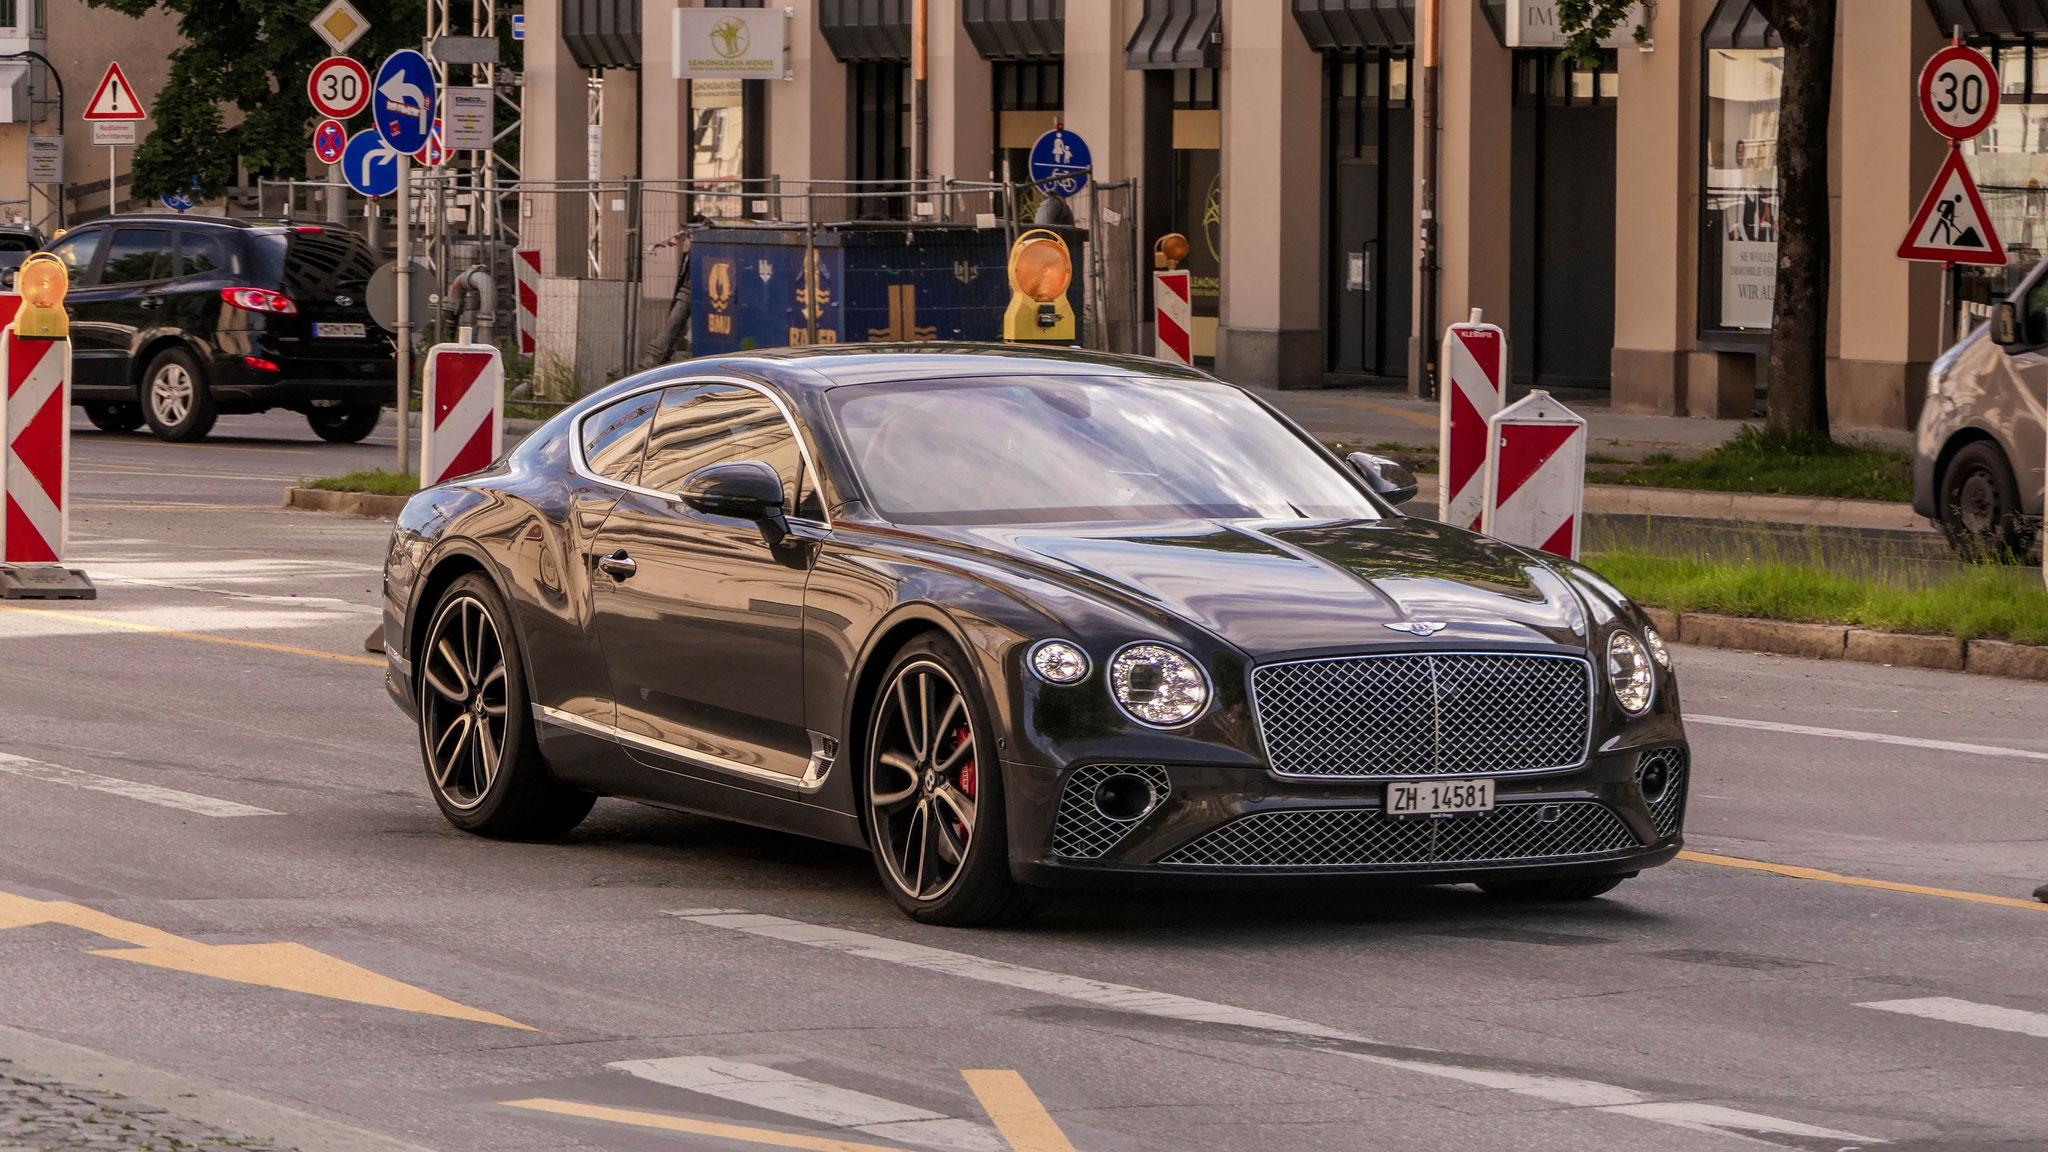 Bentley Continental GT - ZH-14581 (CH),